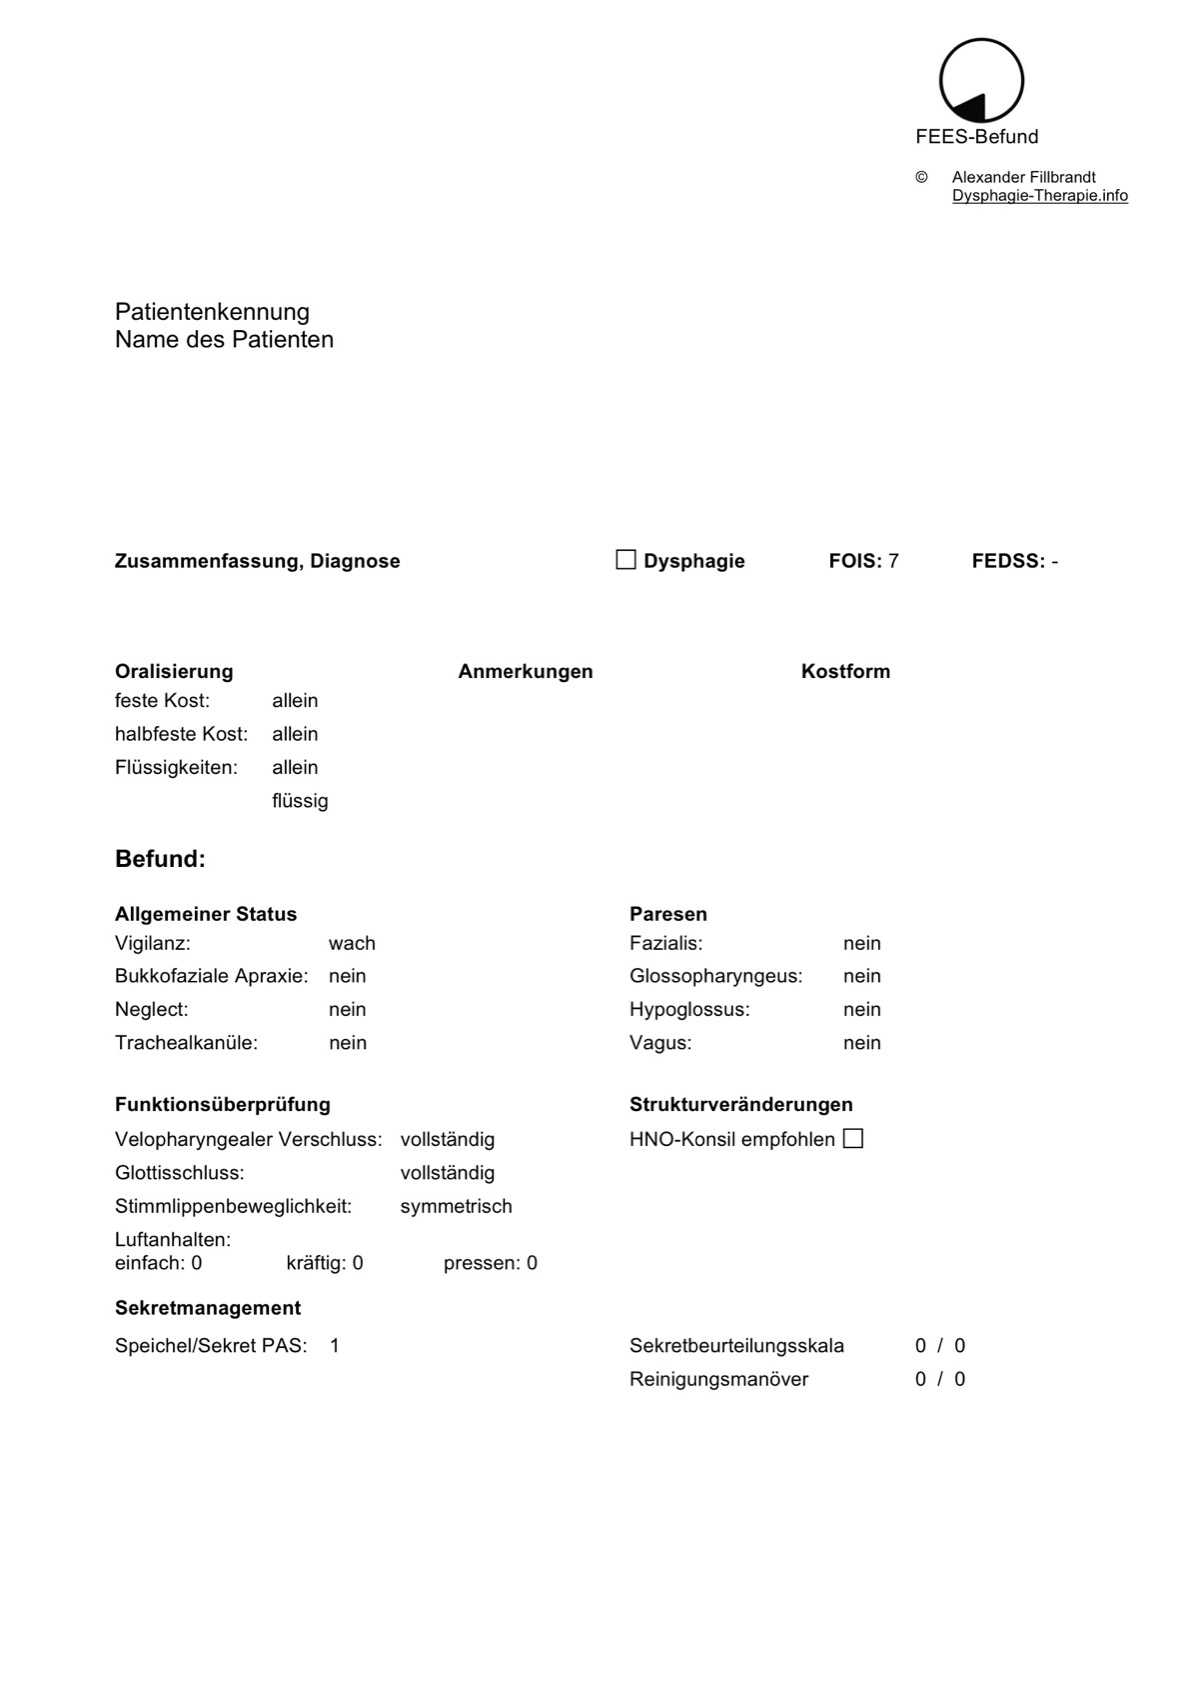 Therapiematerial zu Dysphagie - madoo.net